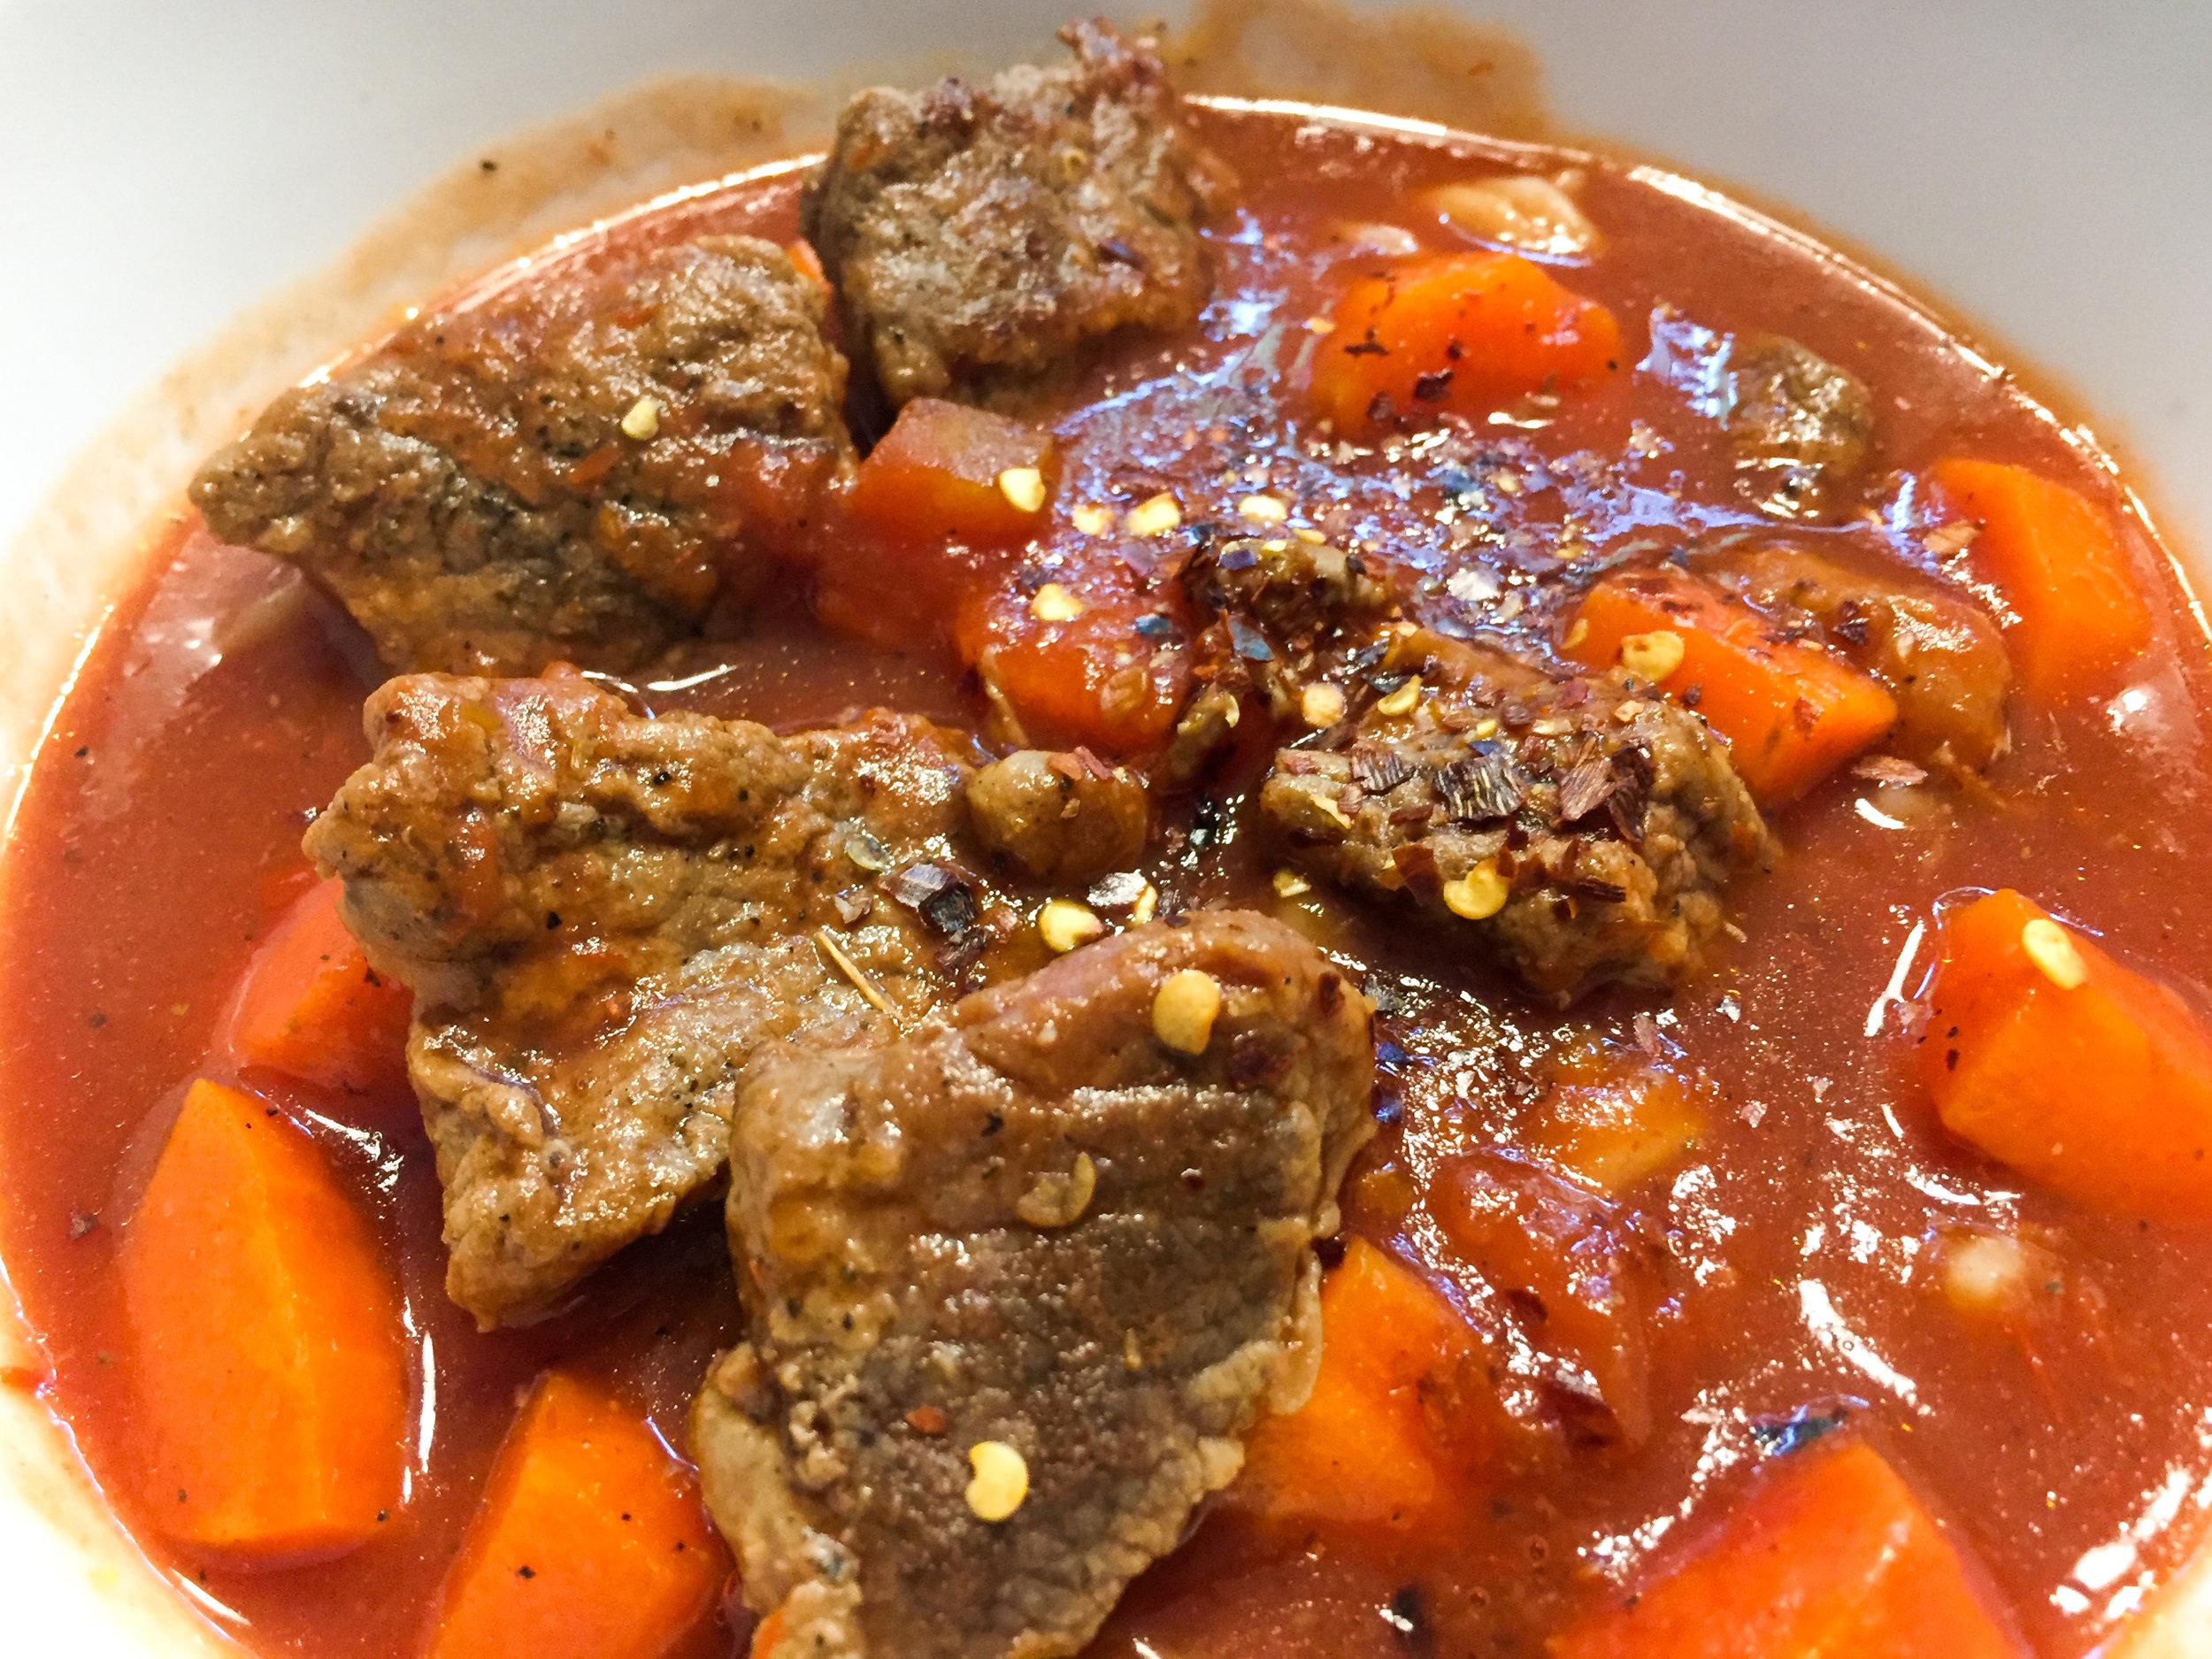 big-10-paleo-spiralizer-cookbook-megan-flynn-peterson-beef-stew-with-sweet-potato-noodles